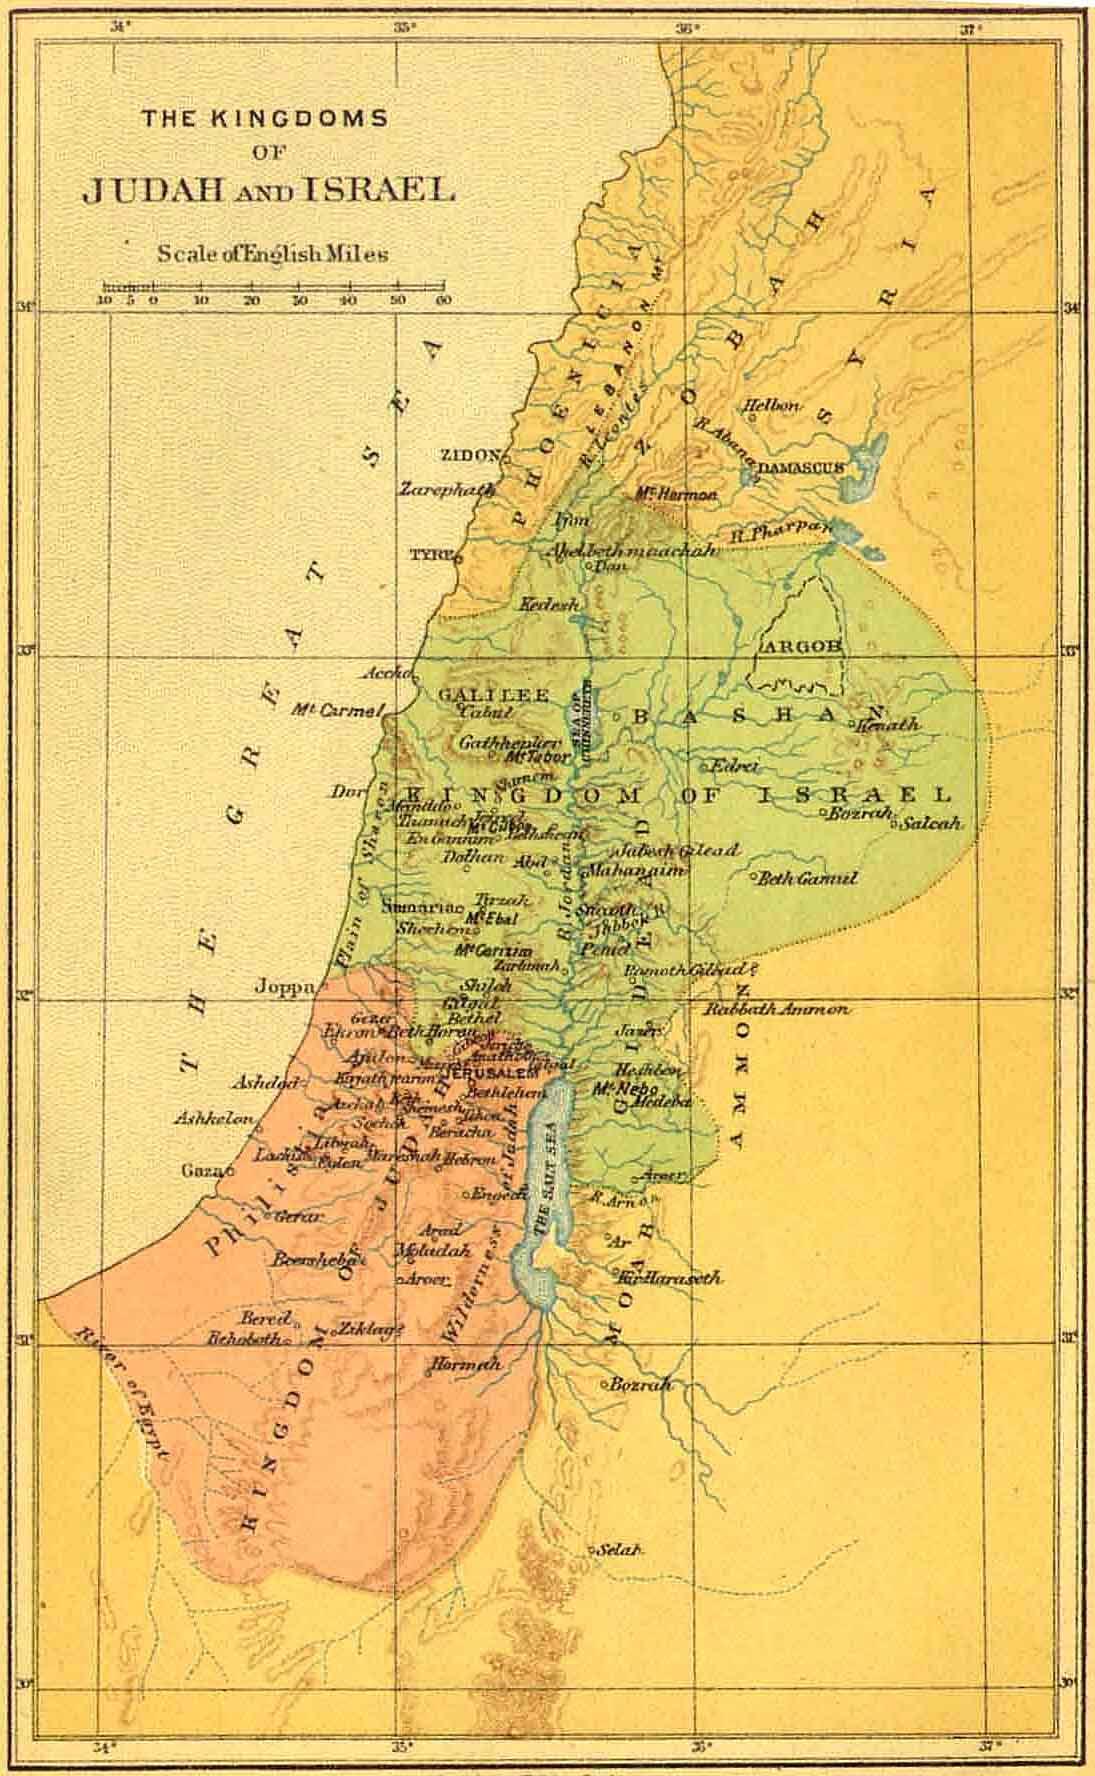 FileKingdoms of Judah and Israeljpg  The Work of Gods Children